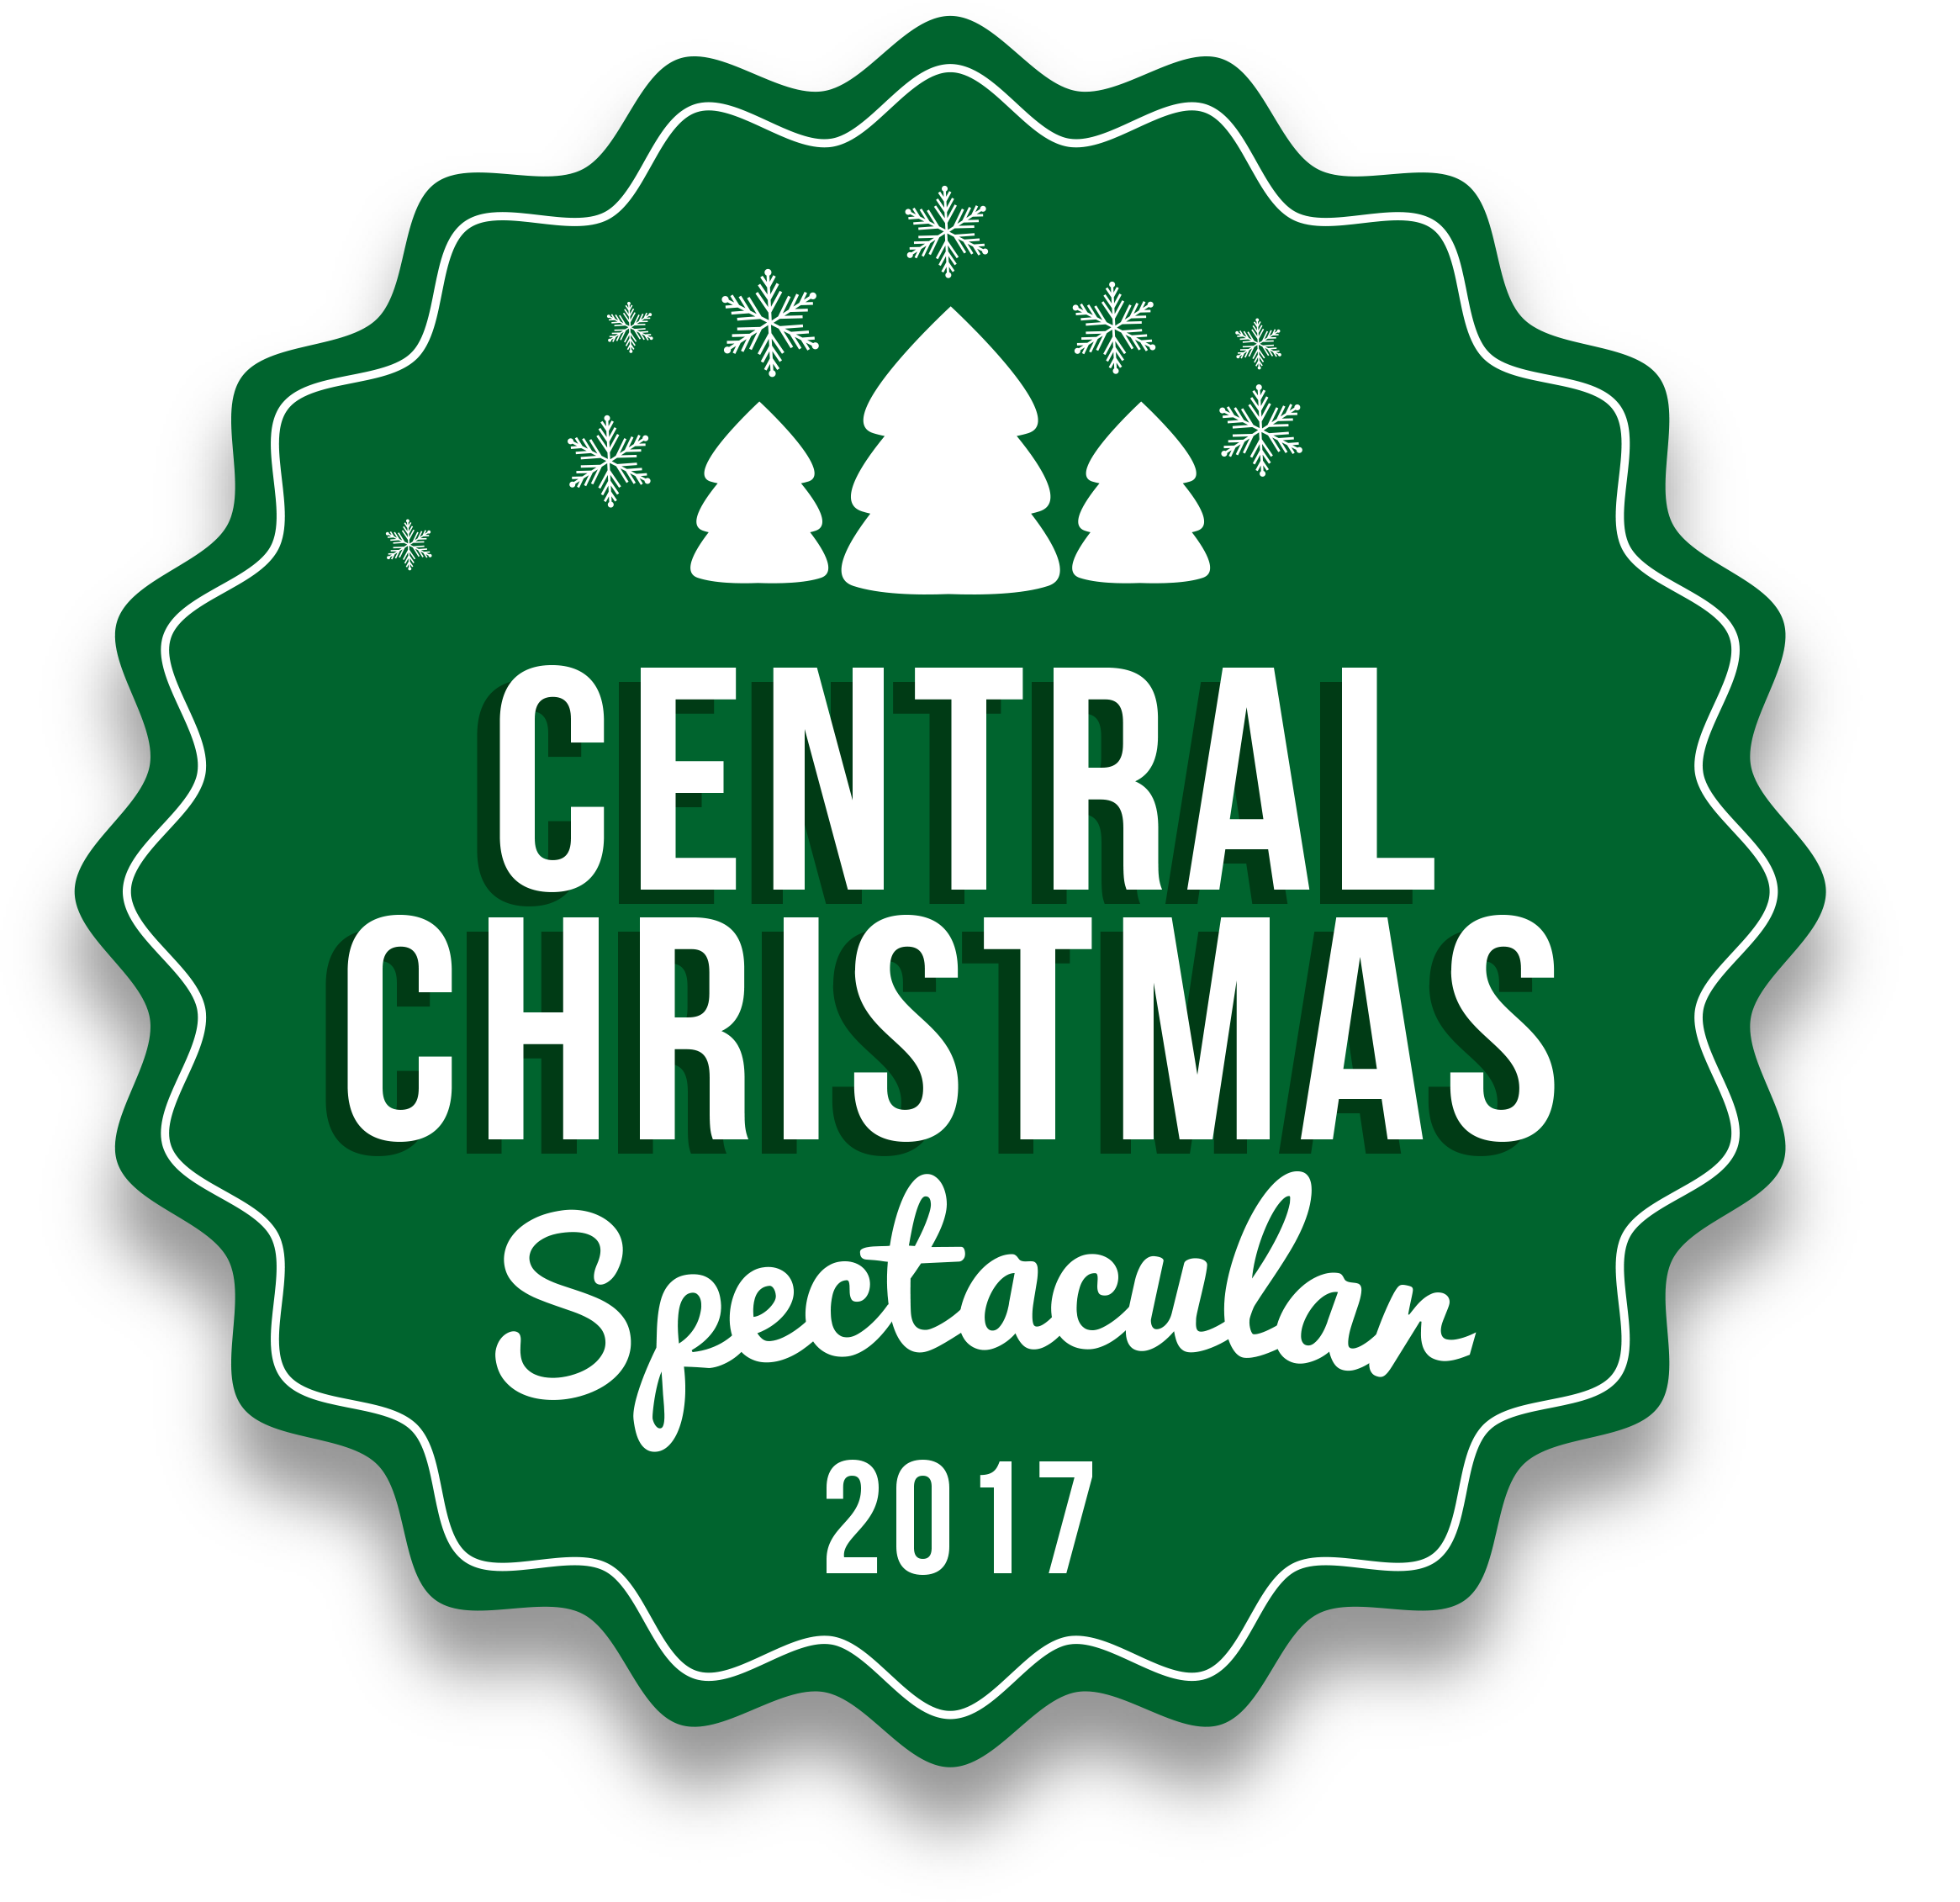 Central Christmas Spectacular